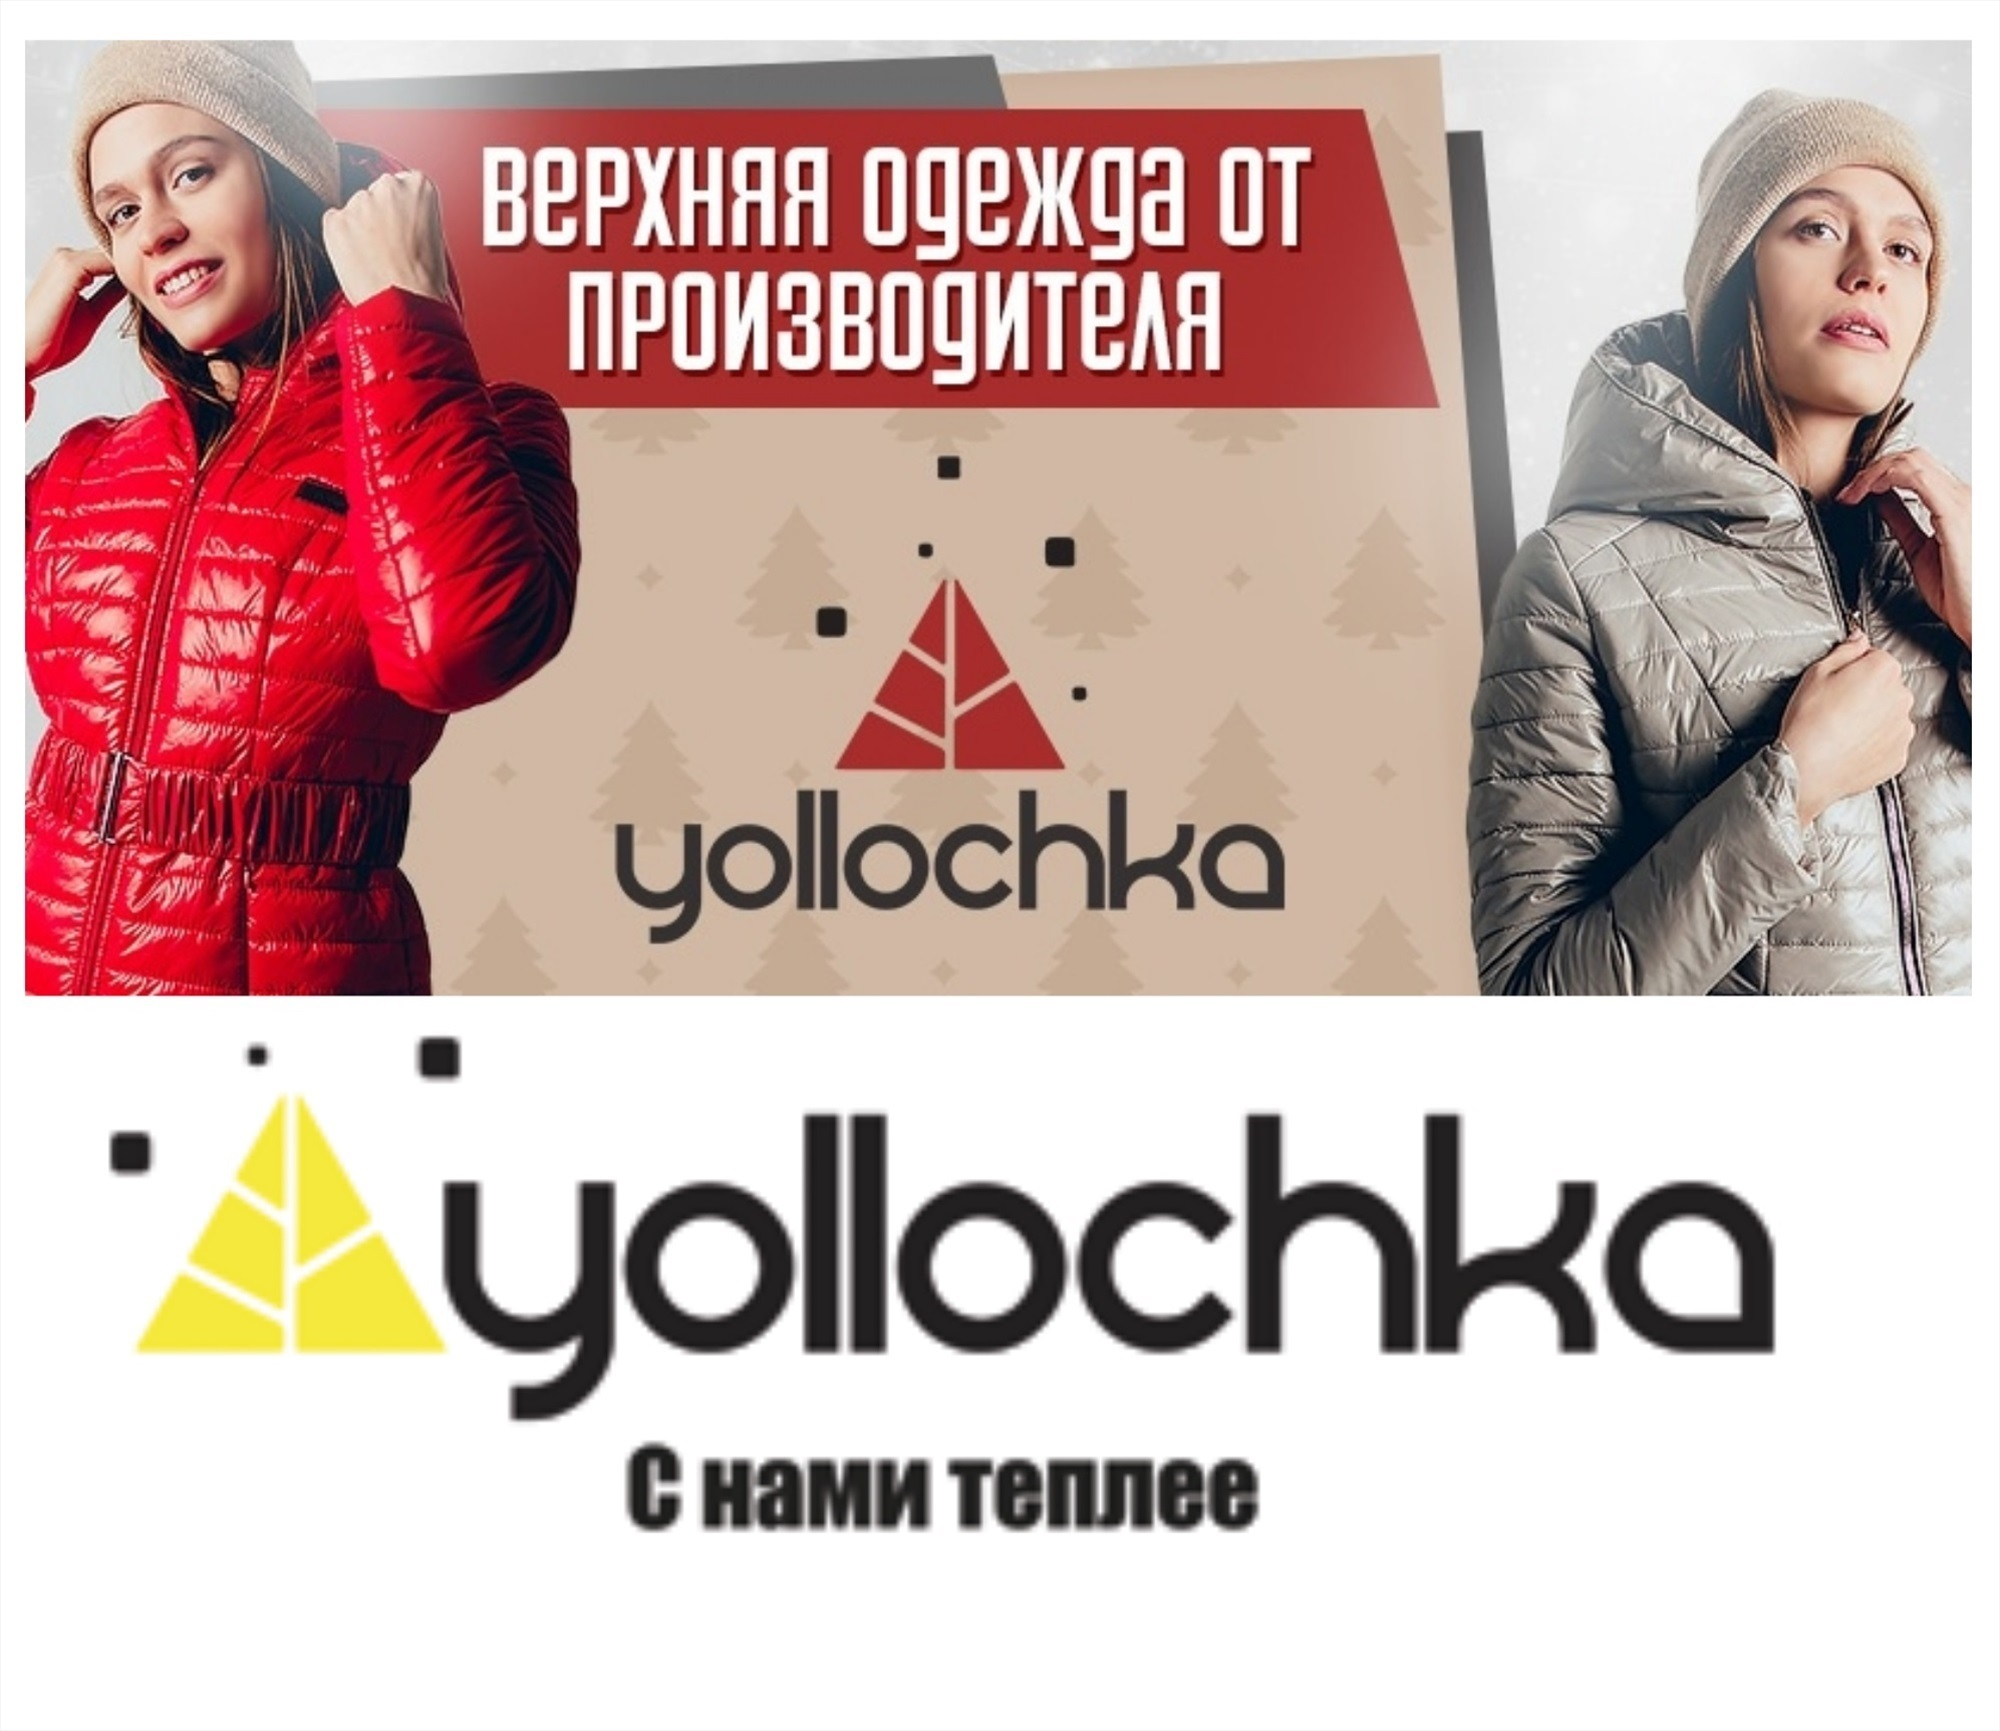 Yollochka Com Интернет Магазин Одежды